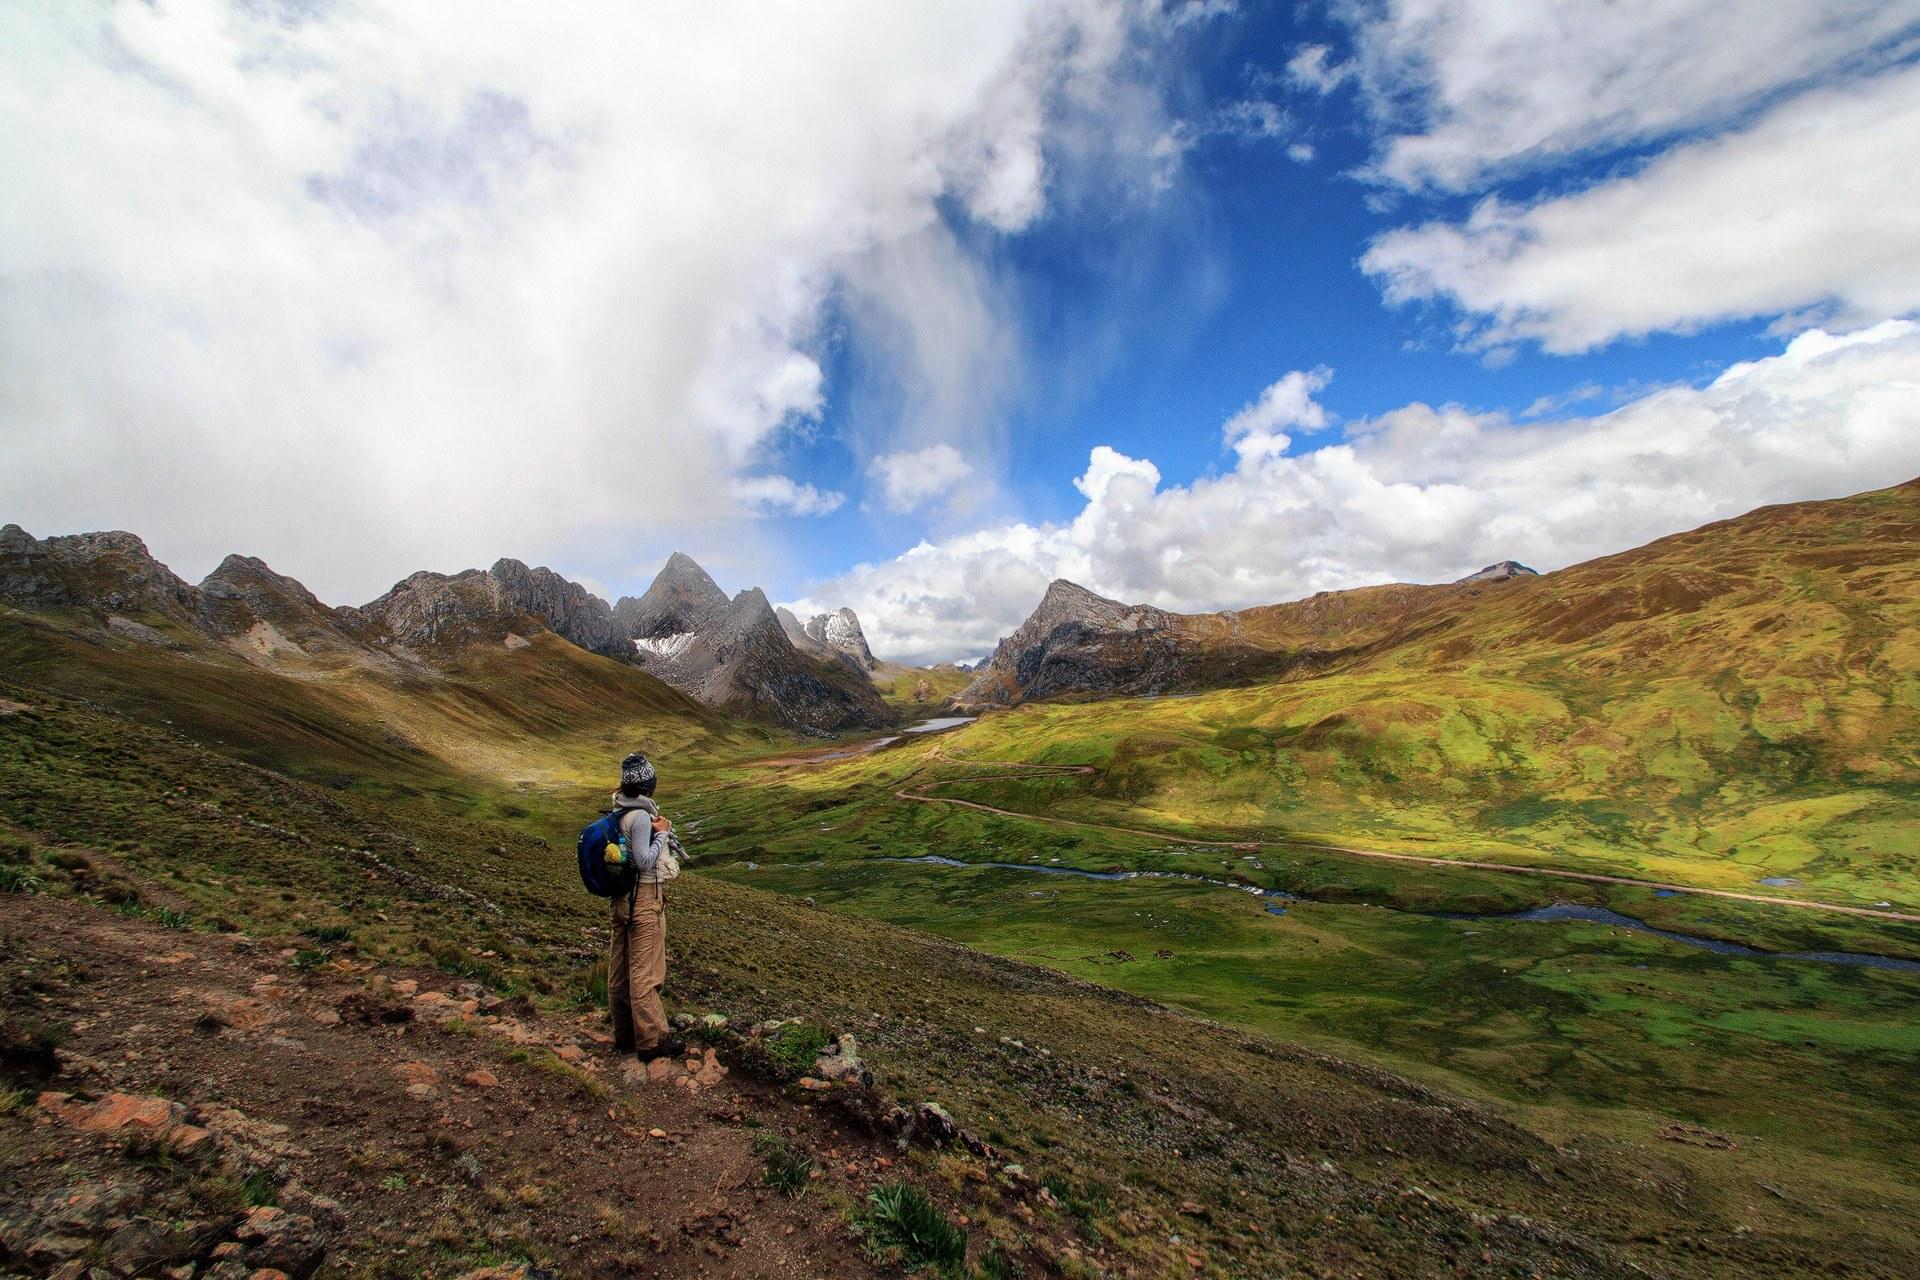 Cordillera Blanca, Huayhuash Circuit, peru, trekking, hiking, Huayhuash-Trek, andes, Anden, hiking, wandern,